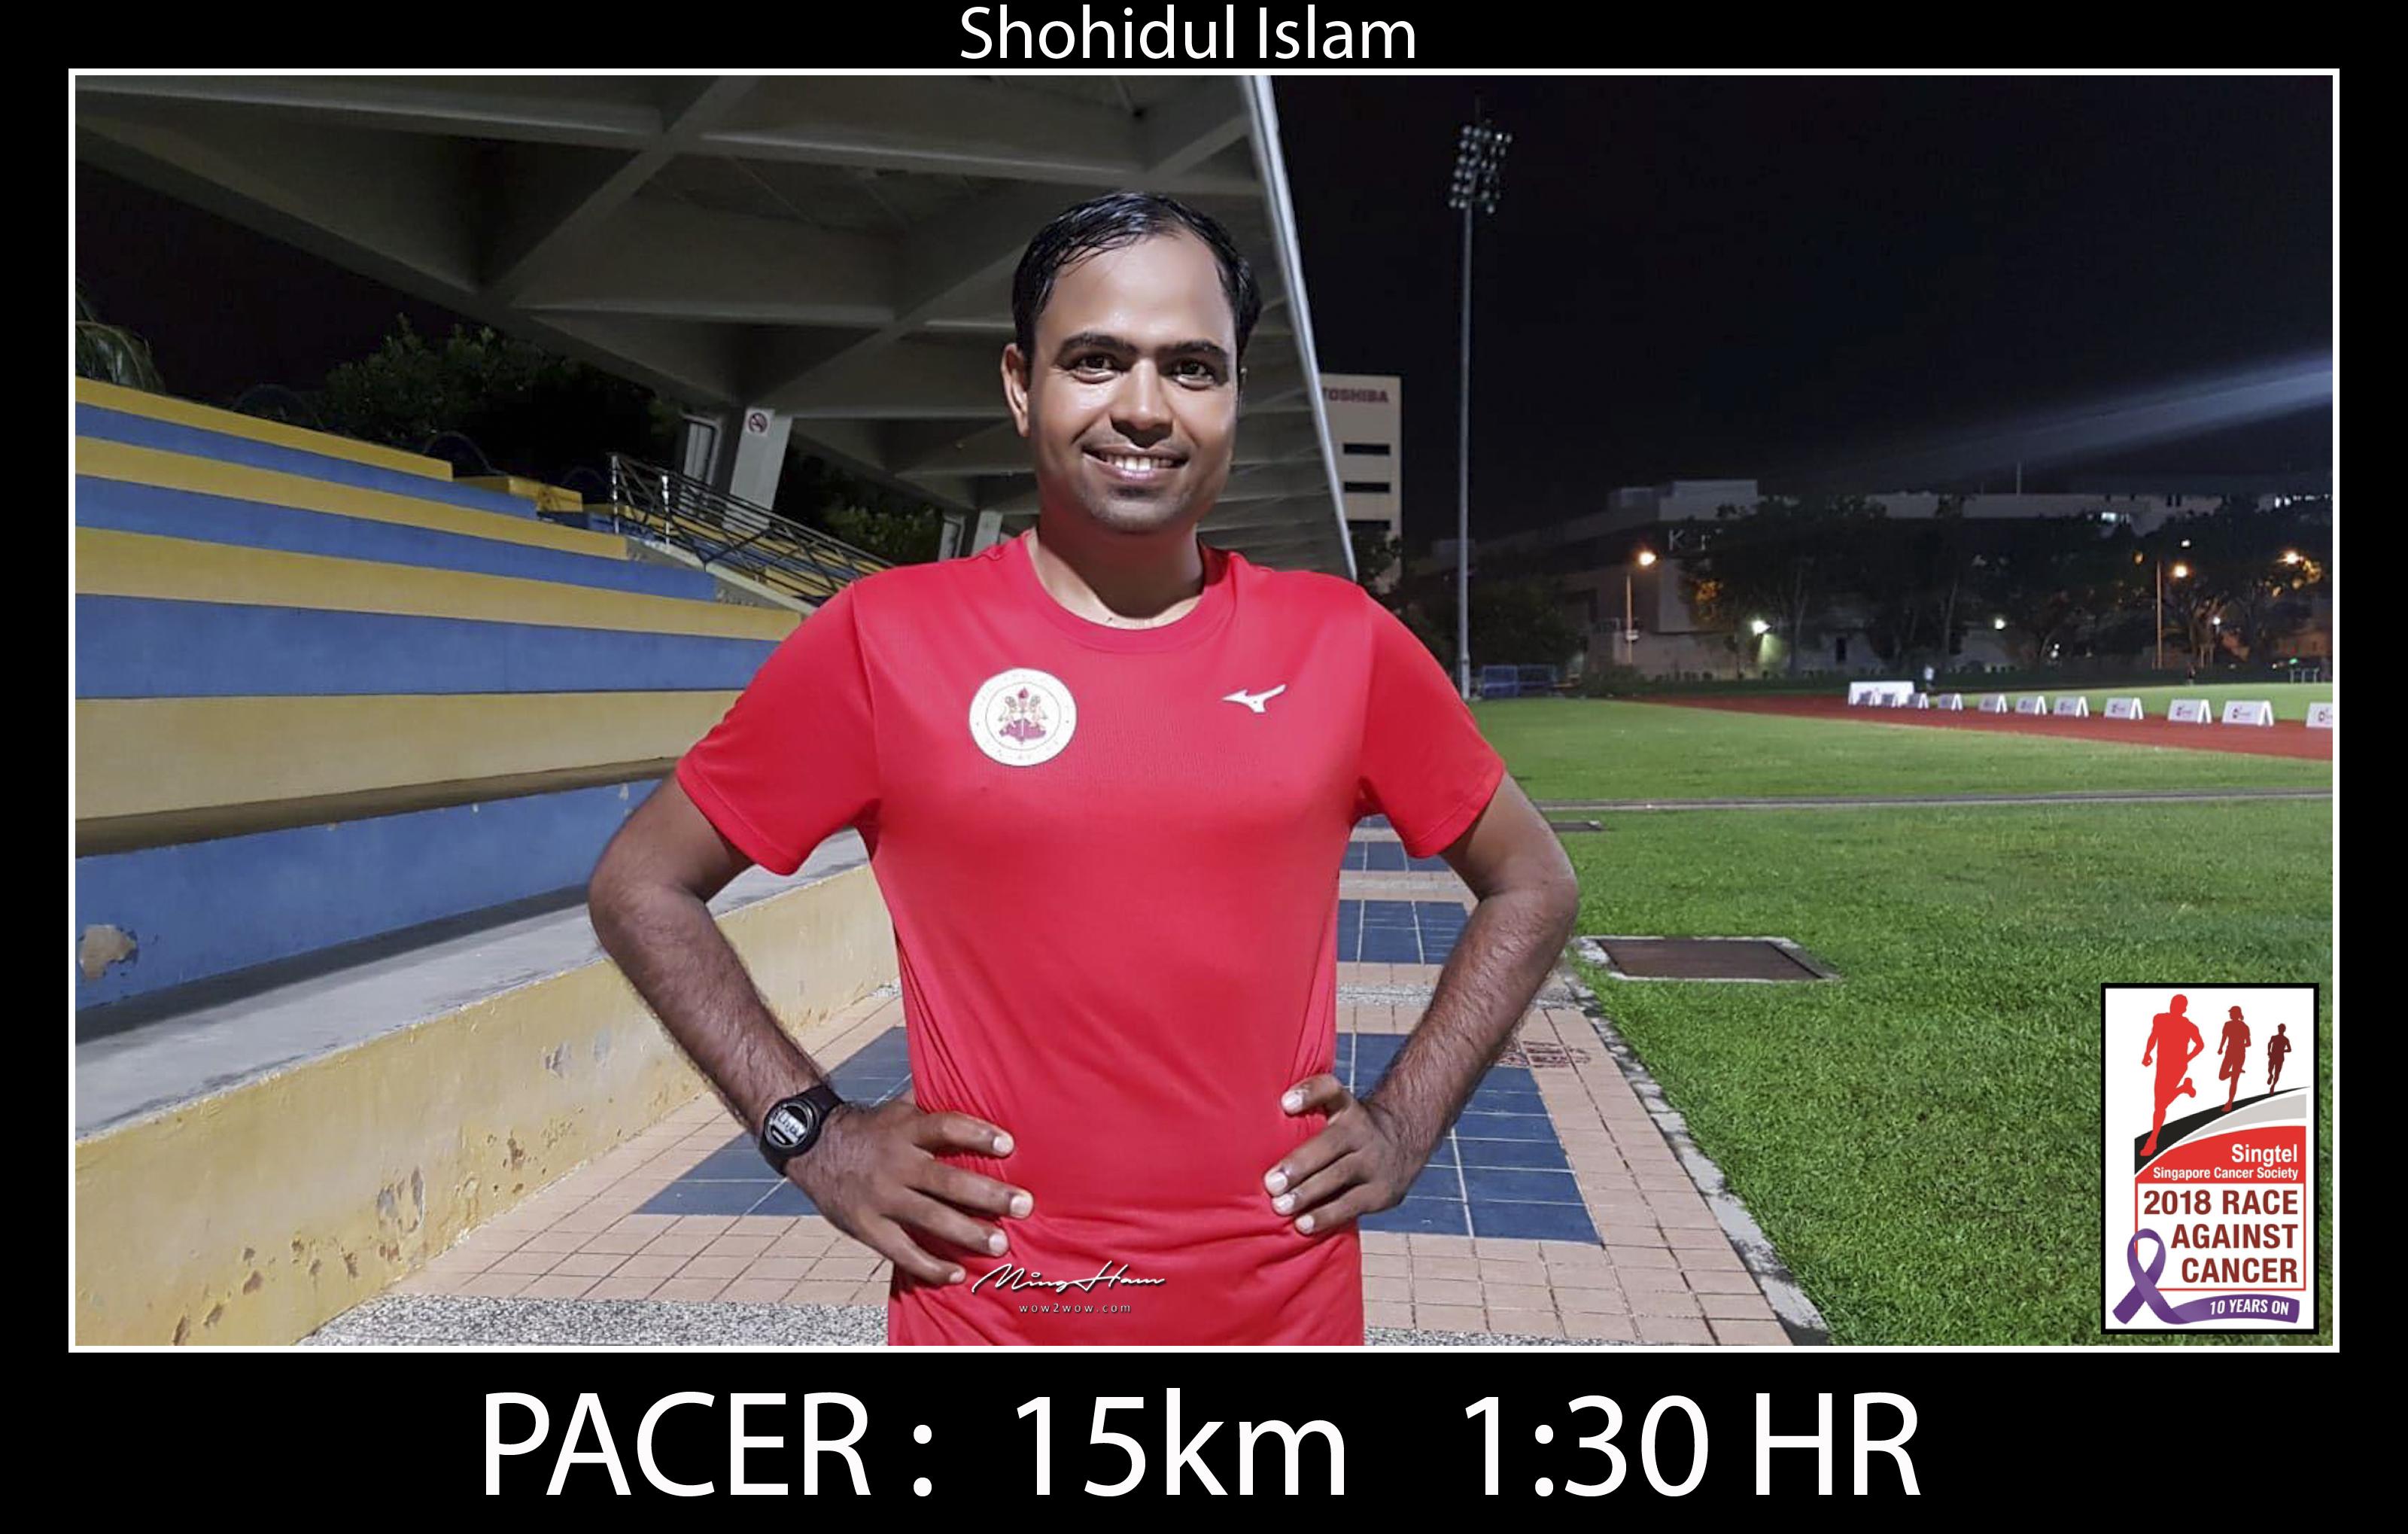 15km 1_30HR Shohidul Islam MH